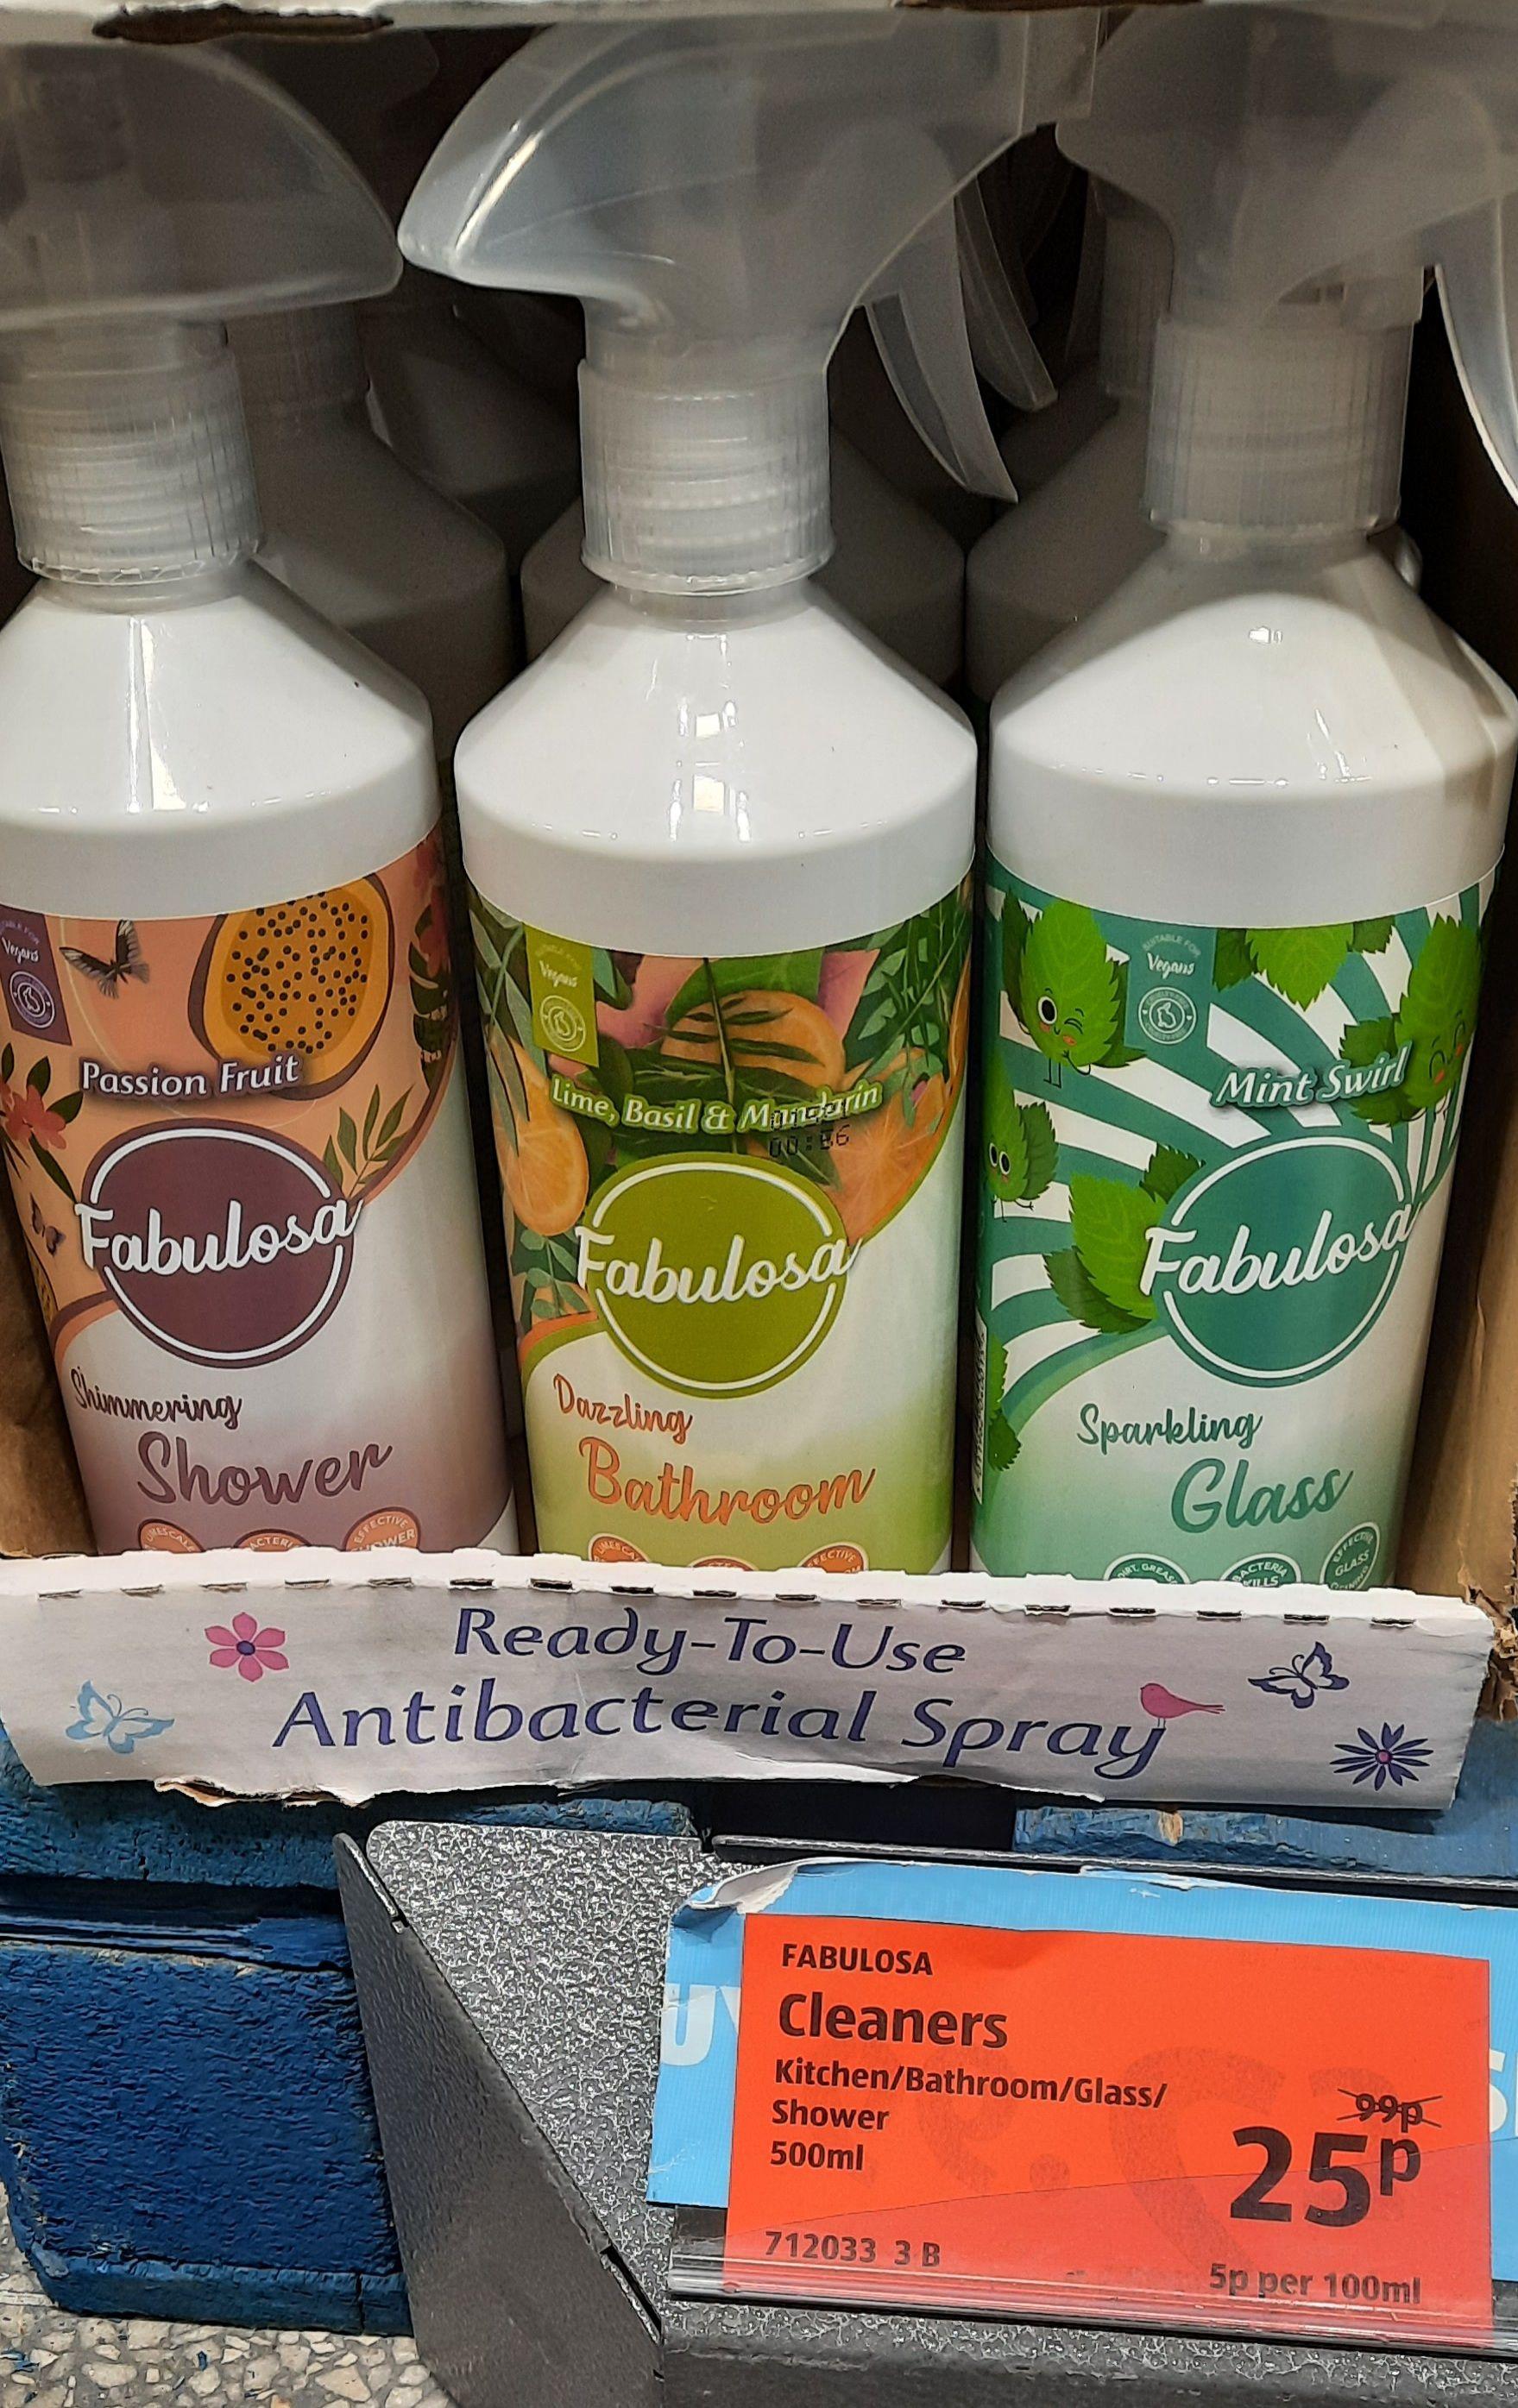 Fabulosa Spray Cleaners, 500ml: Passionfruit / Lime, Basil & Mandarin / Mint Swirl - 25p instore @ Aldi, Preston